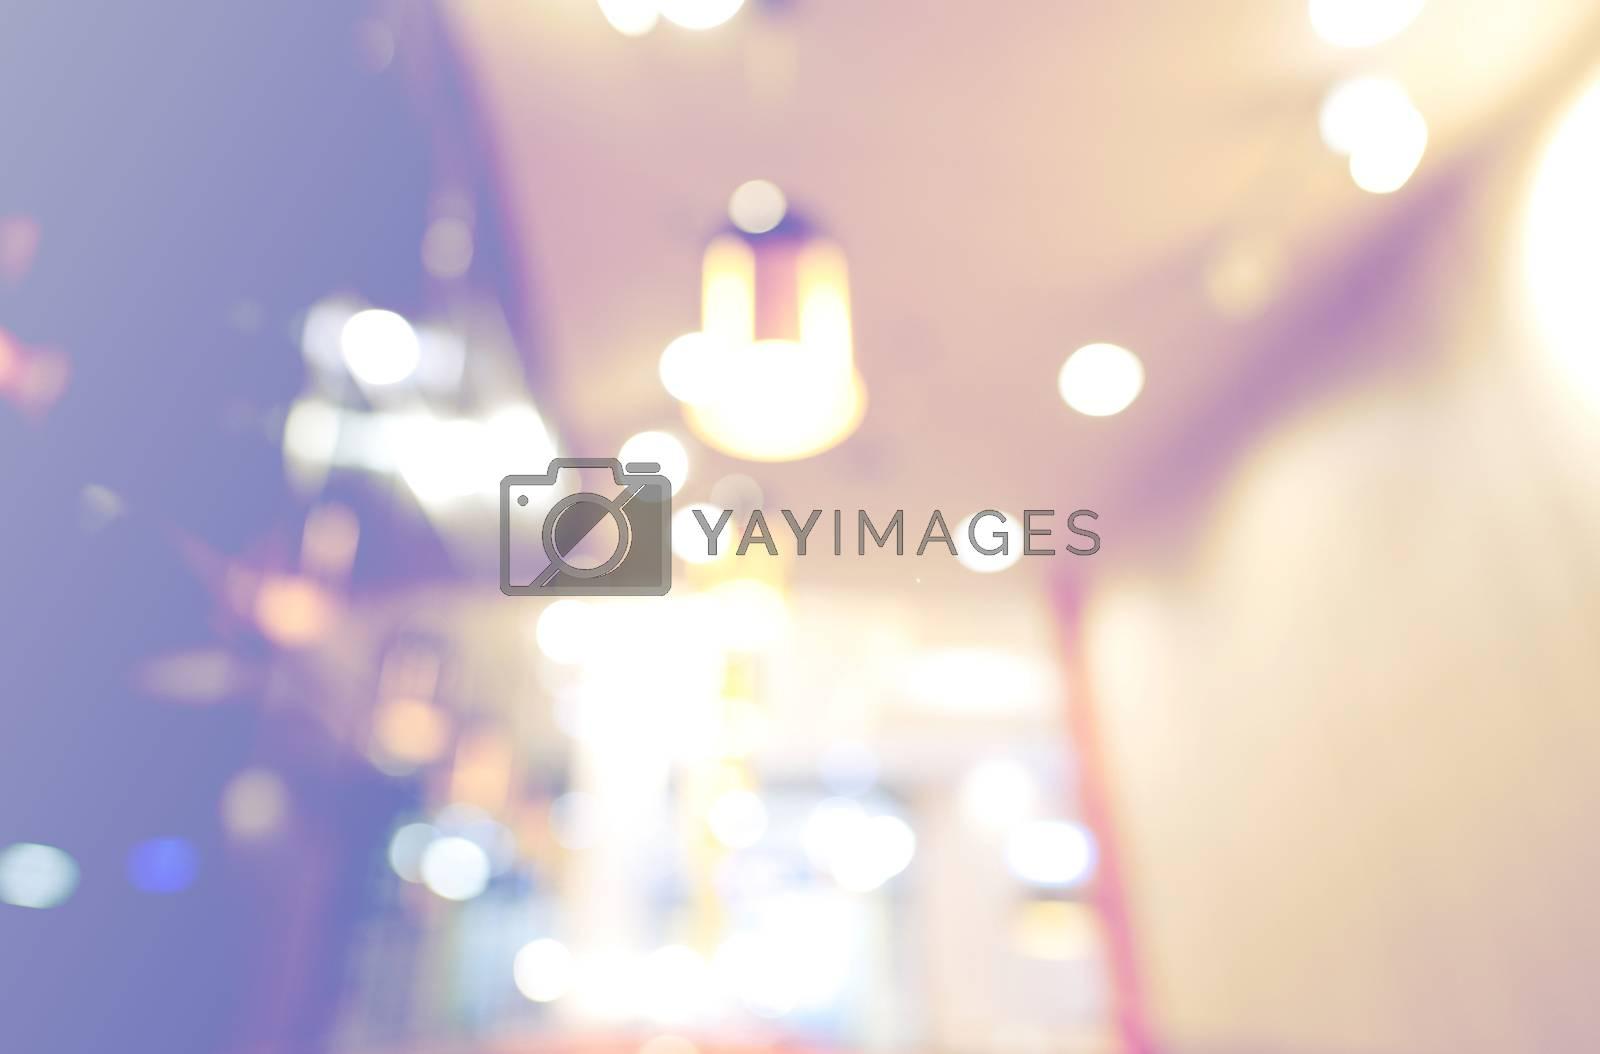 Blurred background image shop lamp caffeine tones purple yellow.